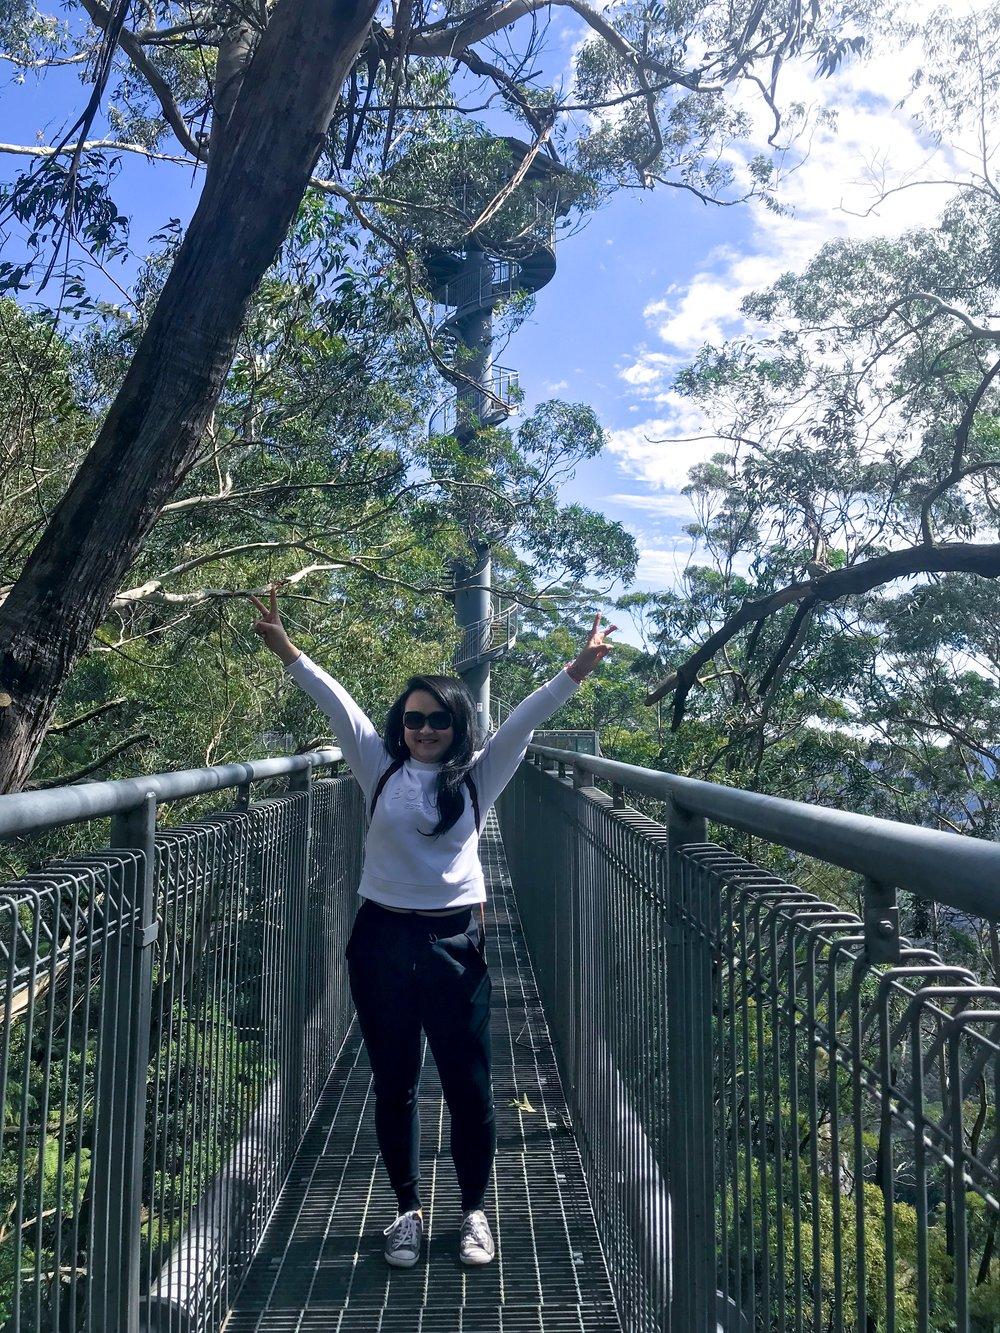 Things To Do in Shellharbour, Illawarra Fly Treetop Walk2.JPG